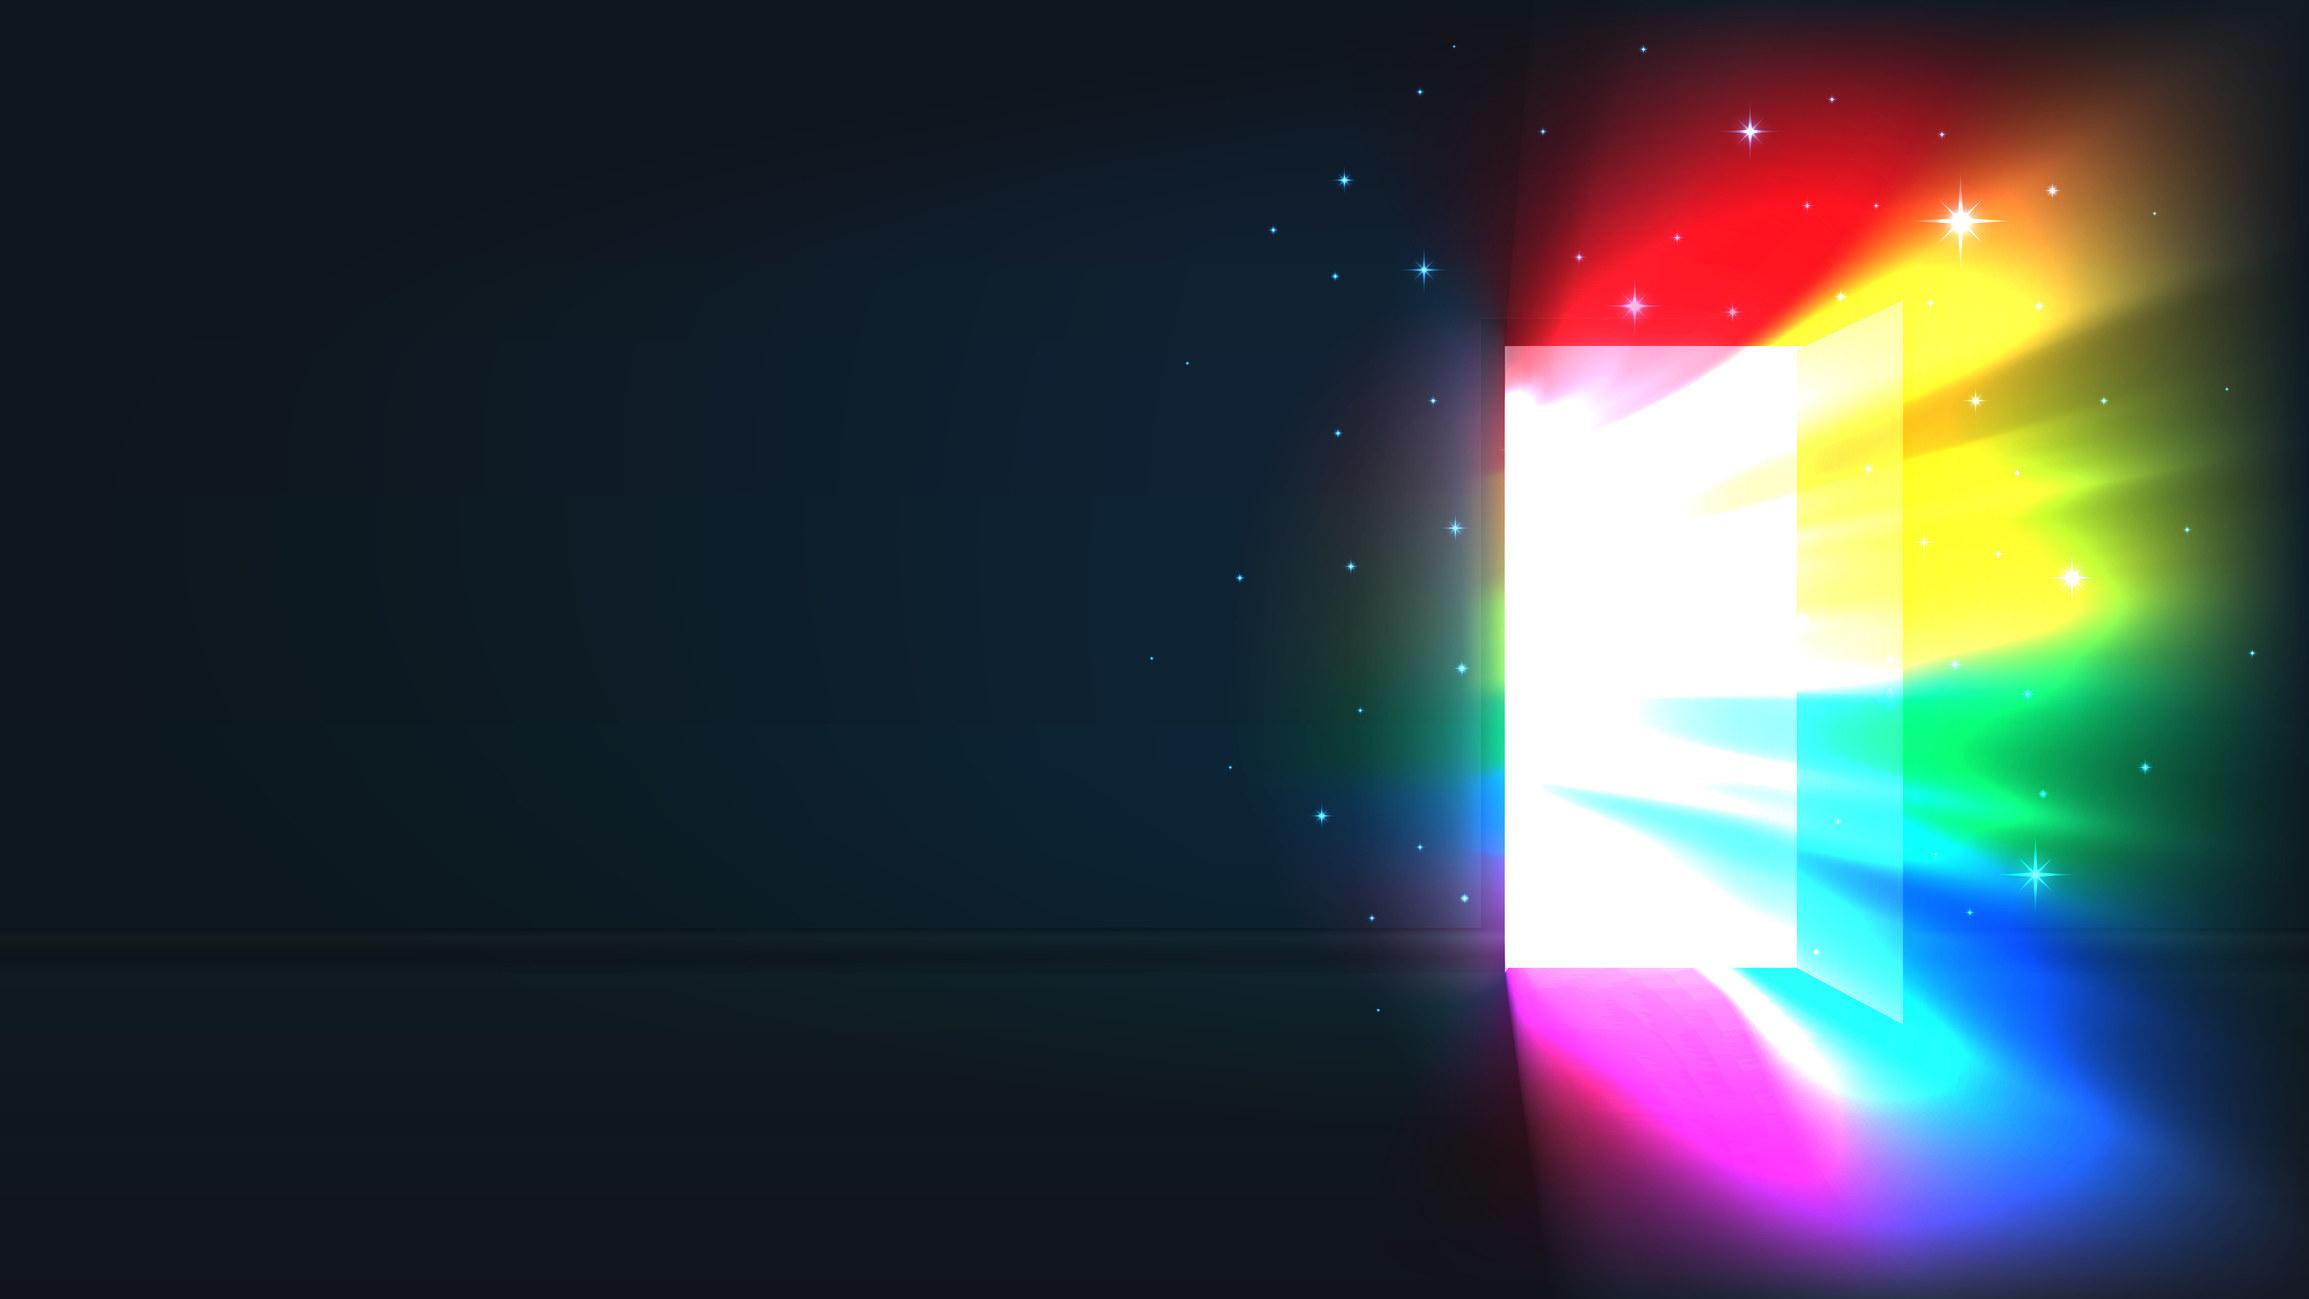 LGBT rainbow light from the open door of a dark room